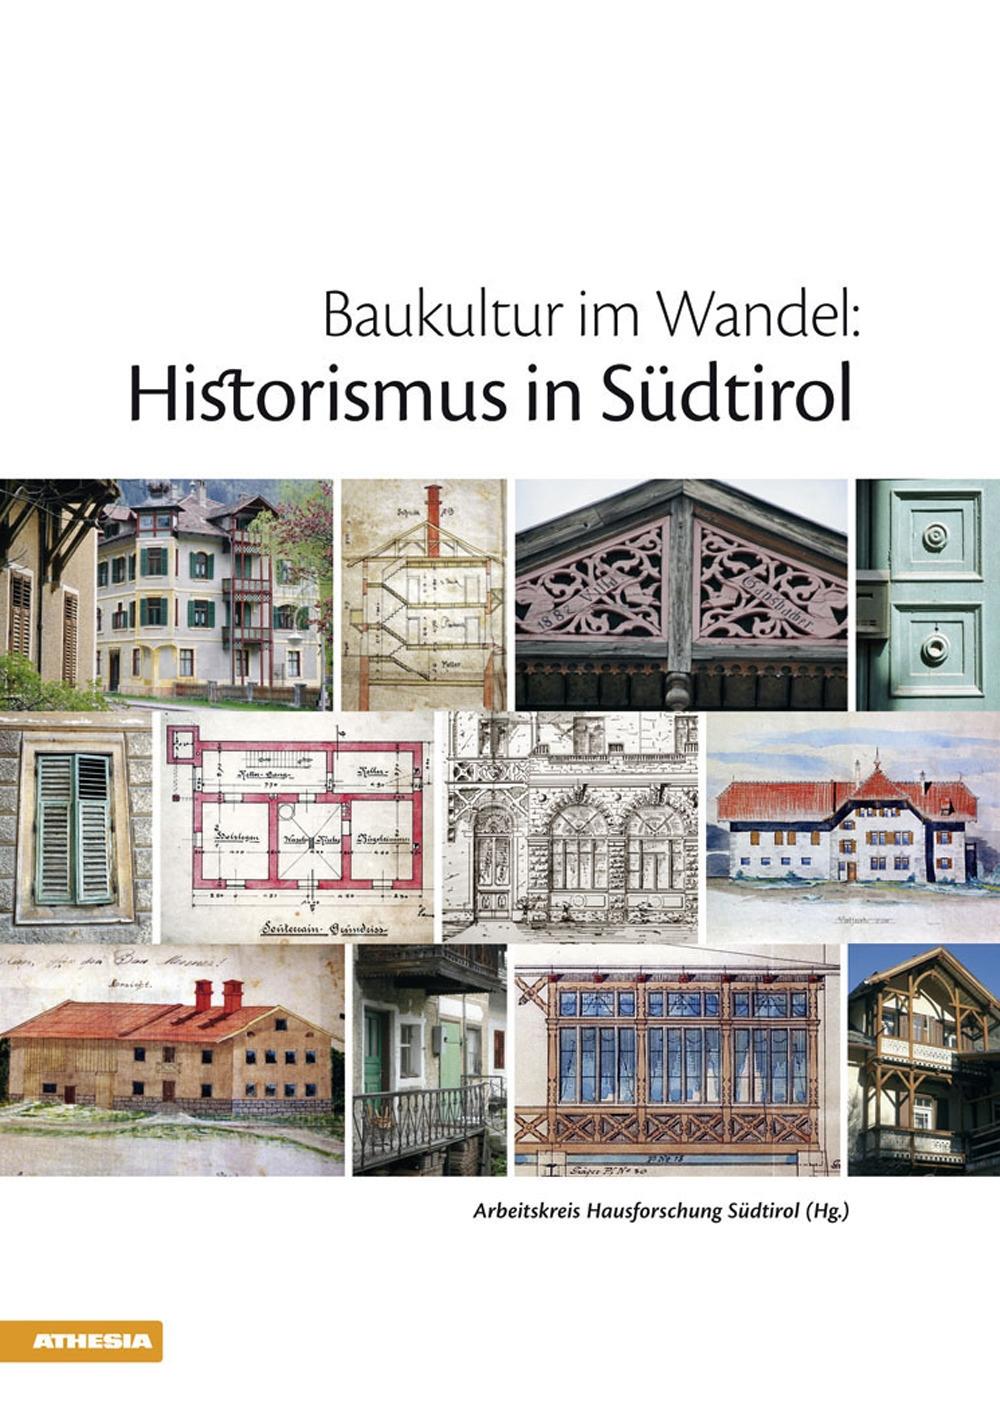 Baukultur im Wandel. Historismus in Südtirol